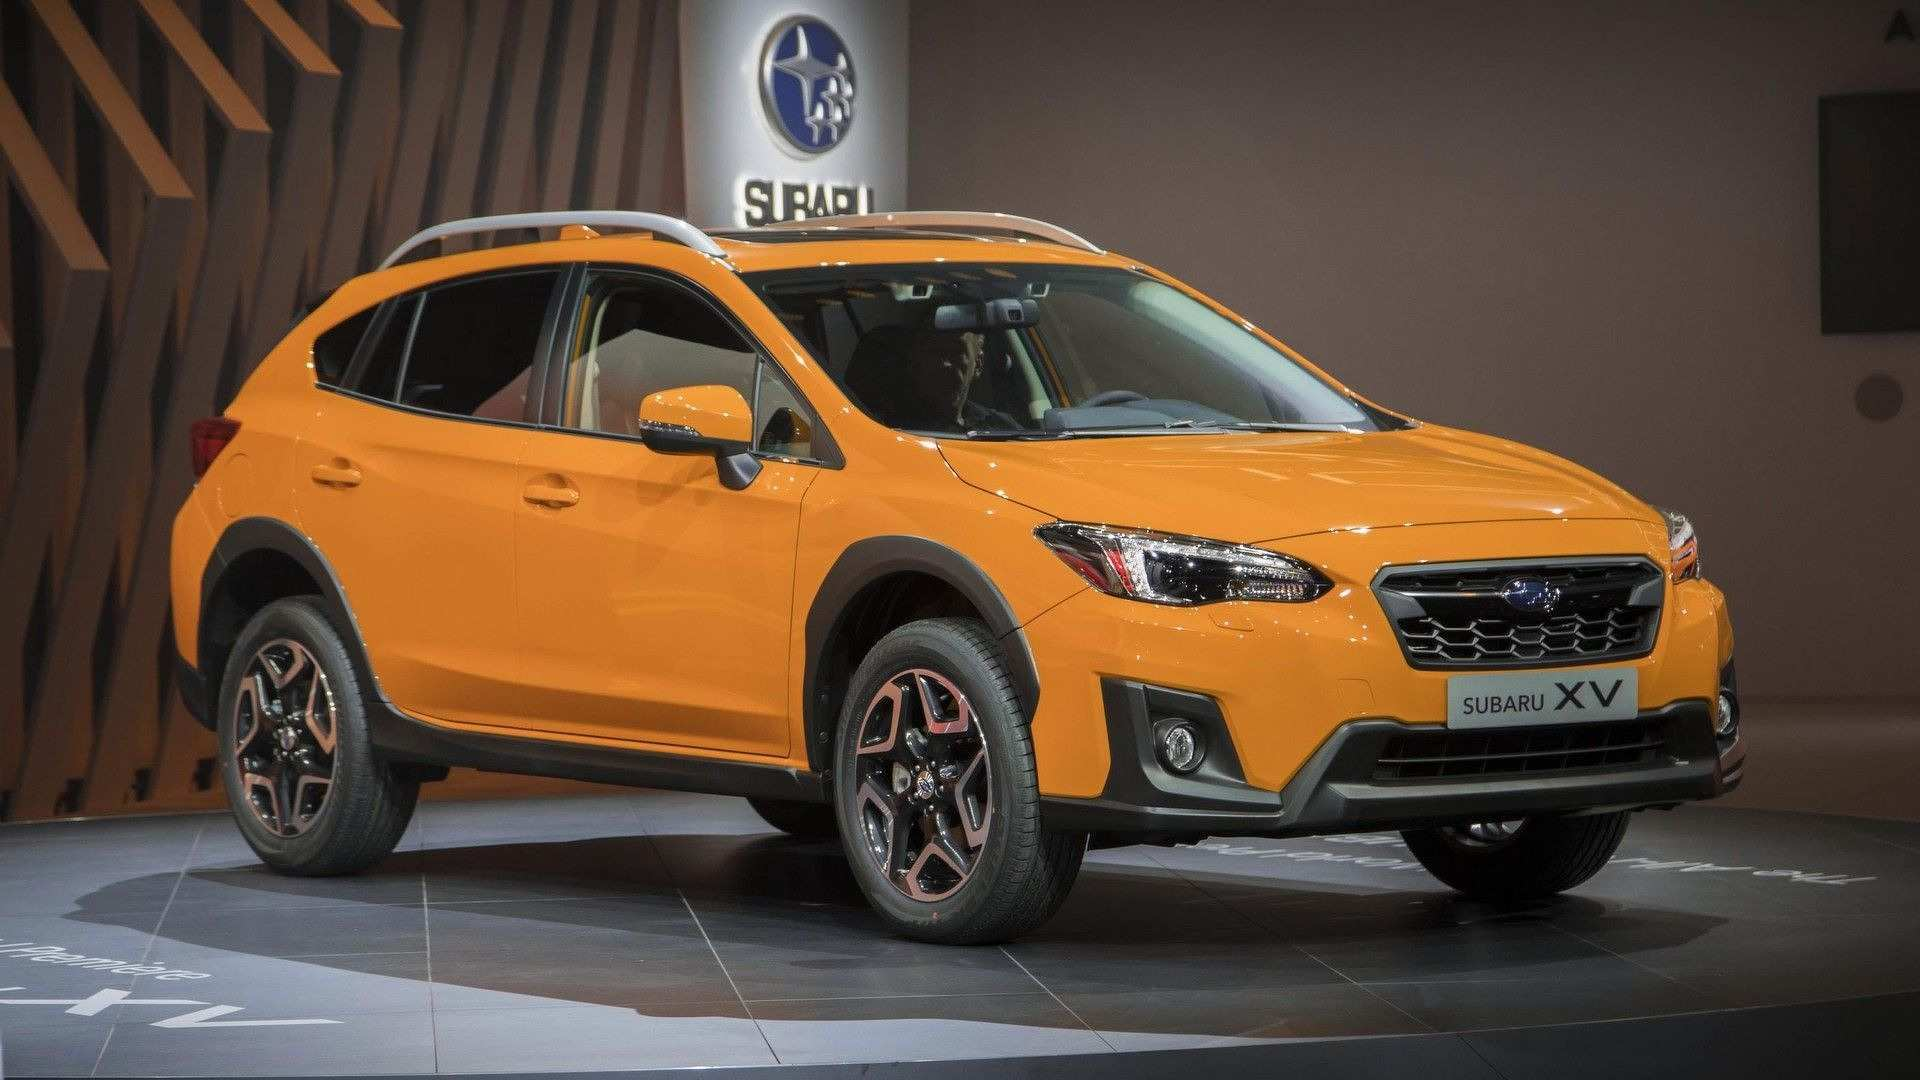 60 All New New Subaru Crosstrek 2019 Review Redesign And Concept Release Date by New Subaru Crosstrek 2019 Review Redesign And Concept